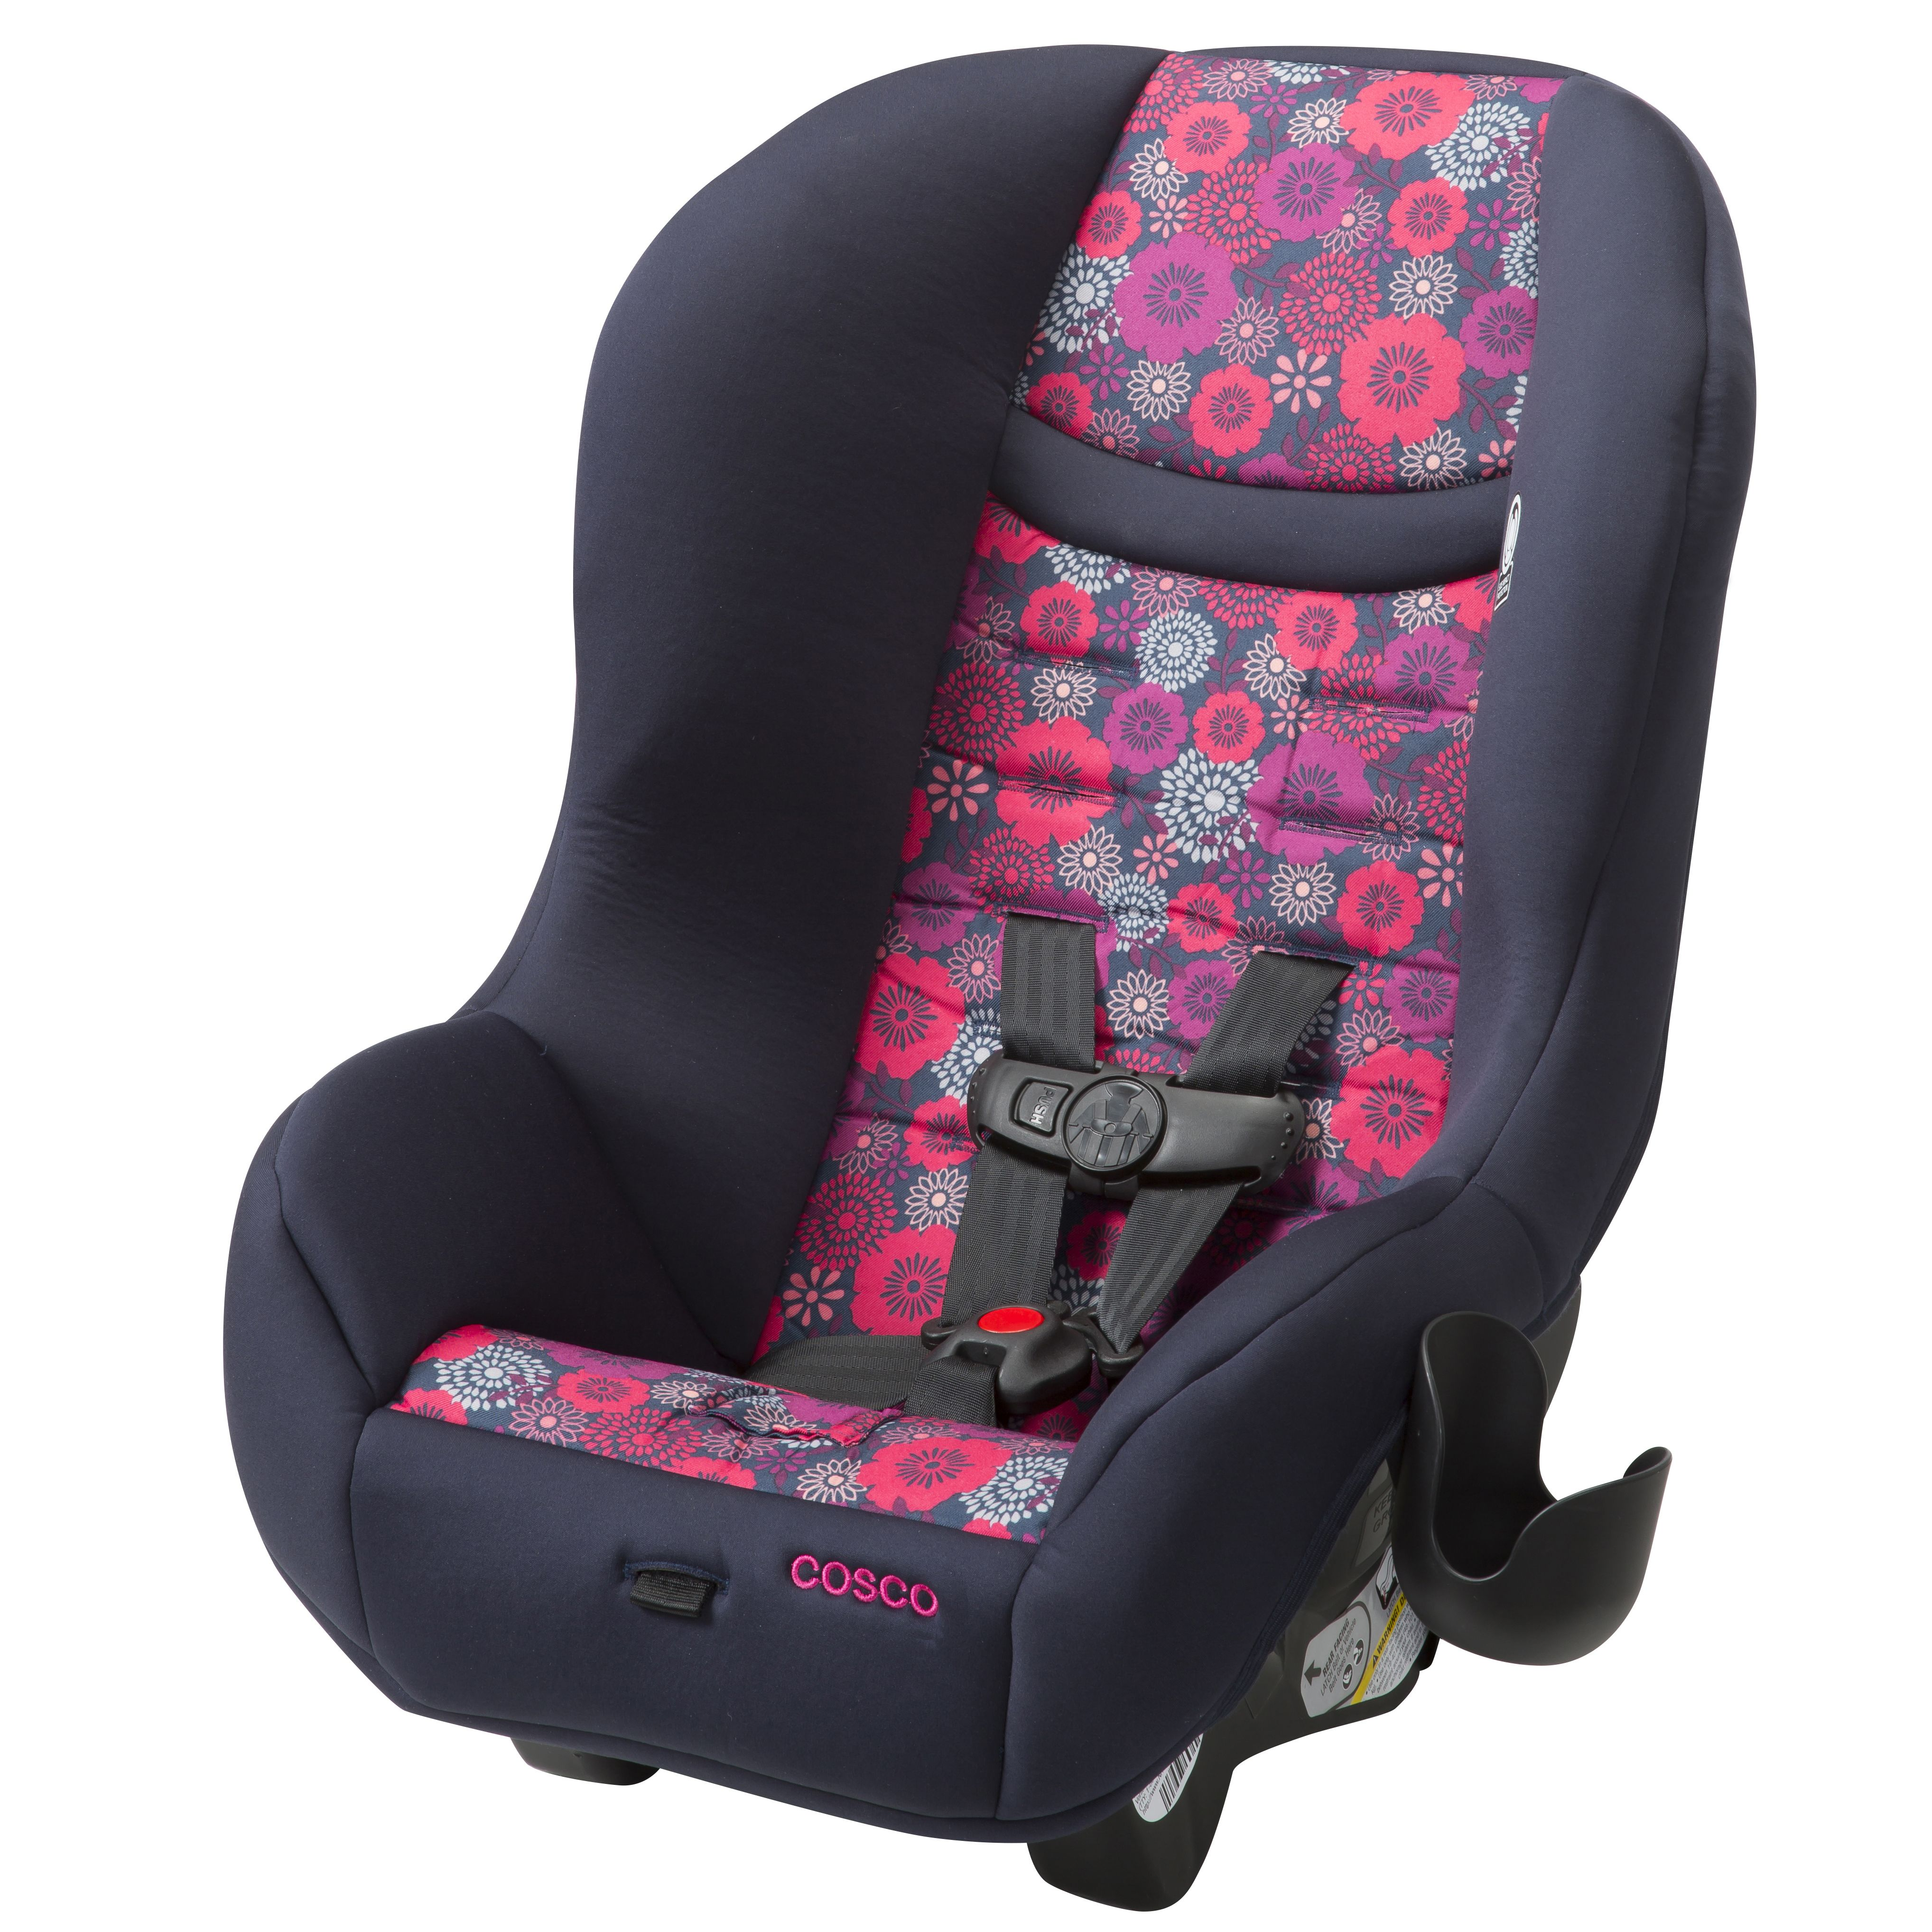 Cosco Scenera NEXT Girl's Car Seat in 2020